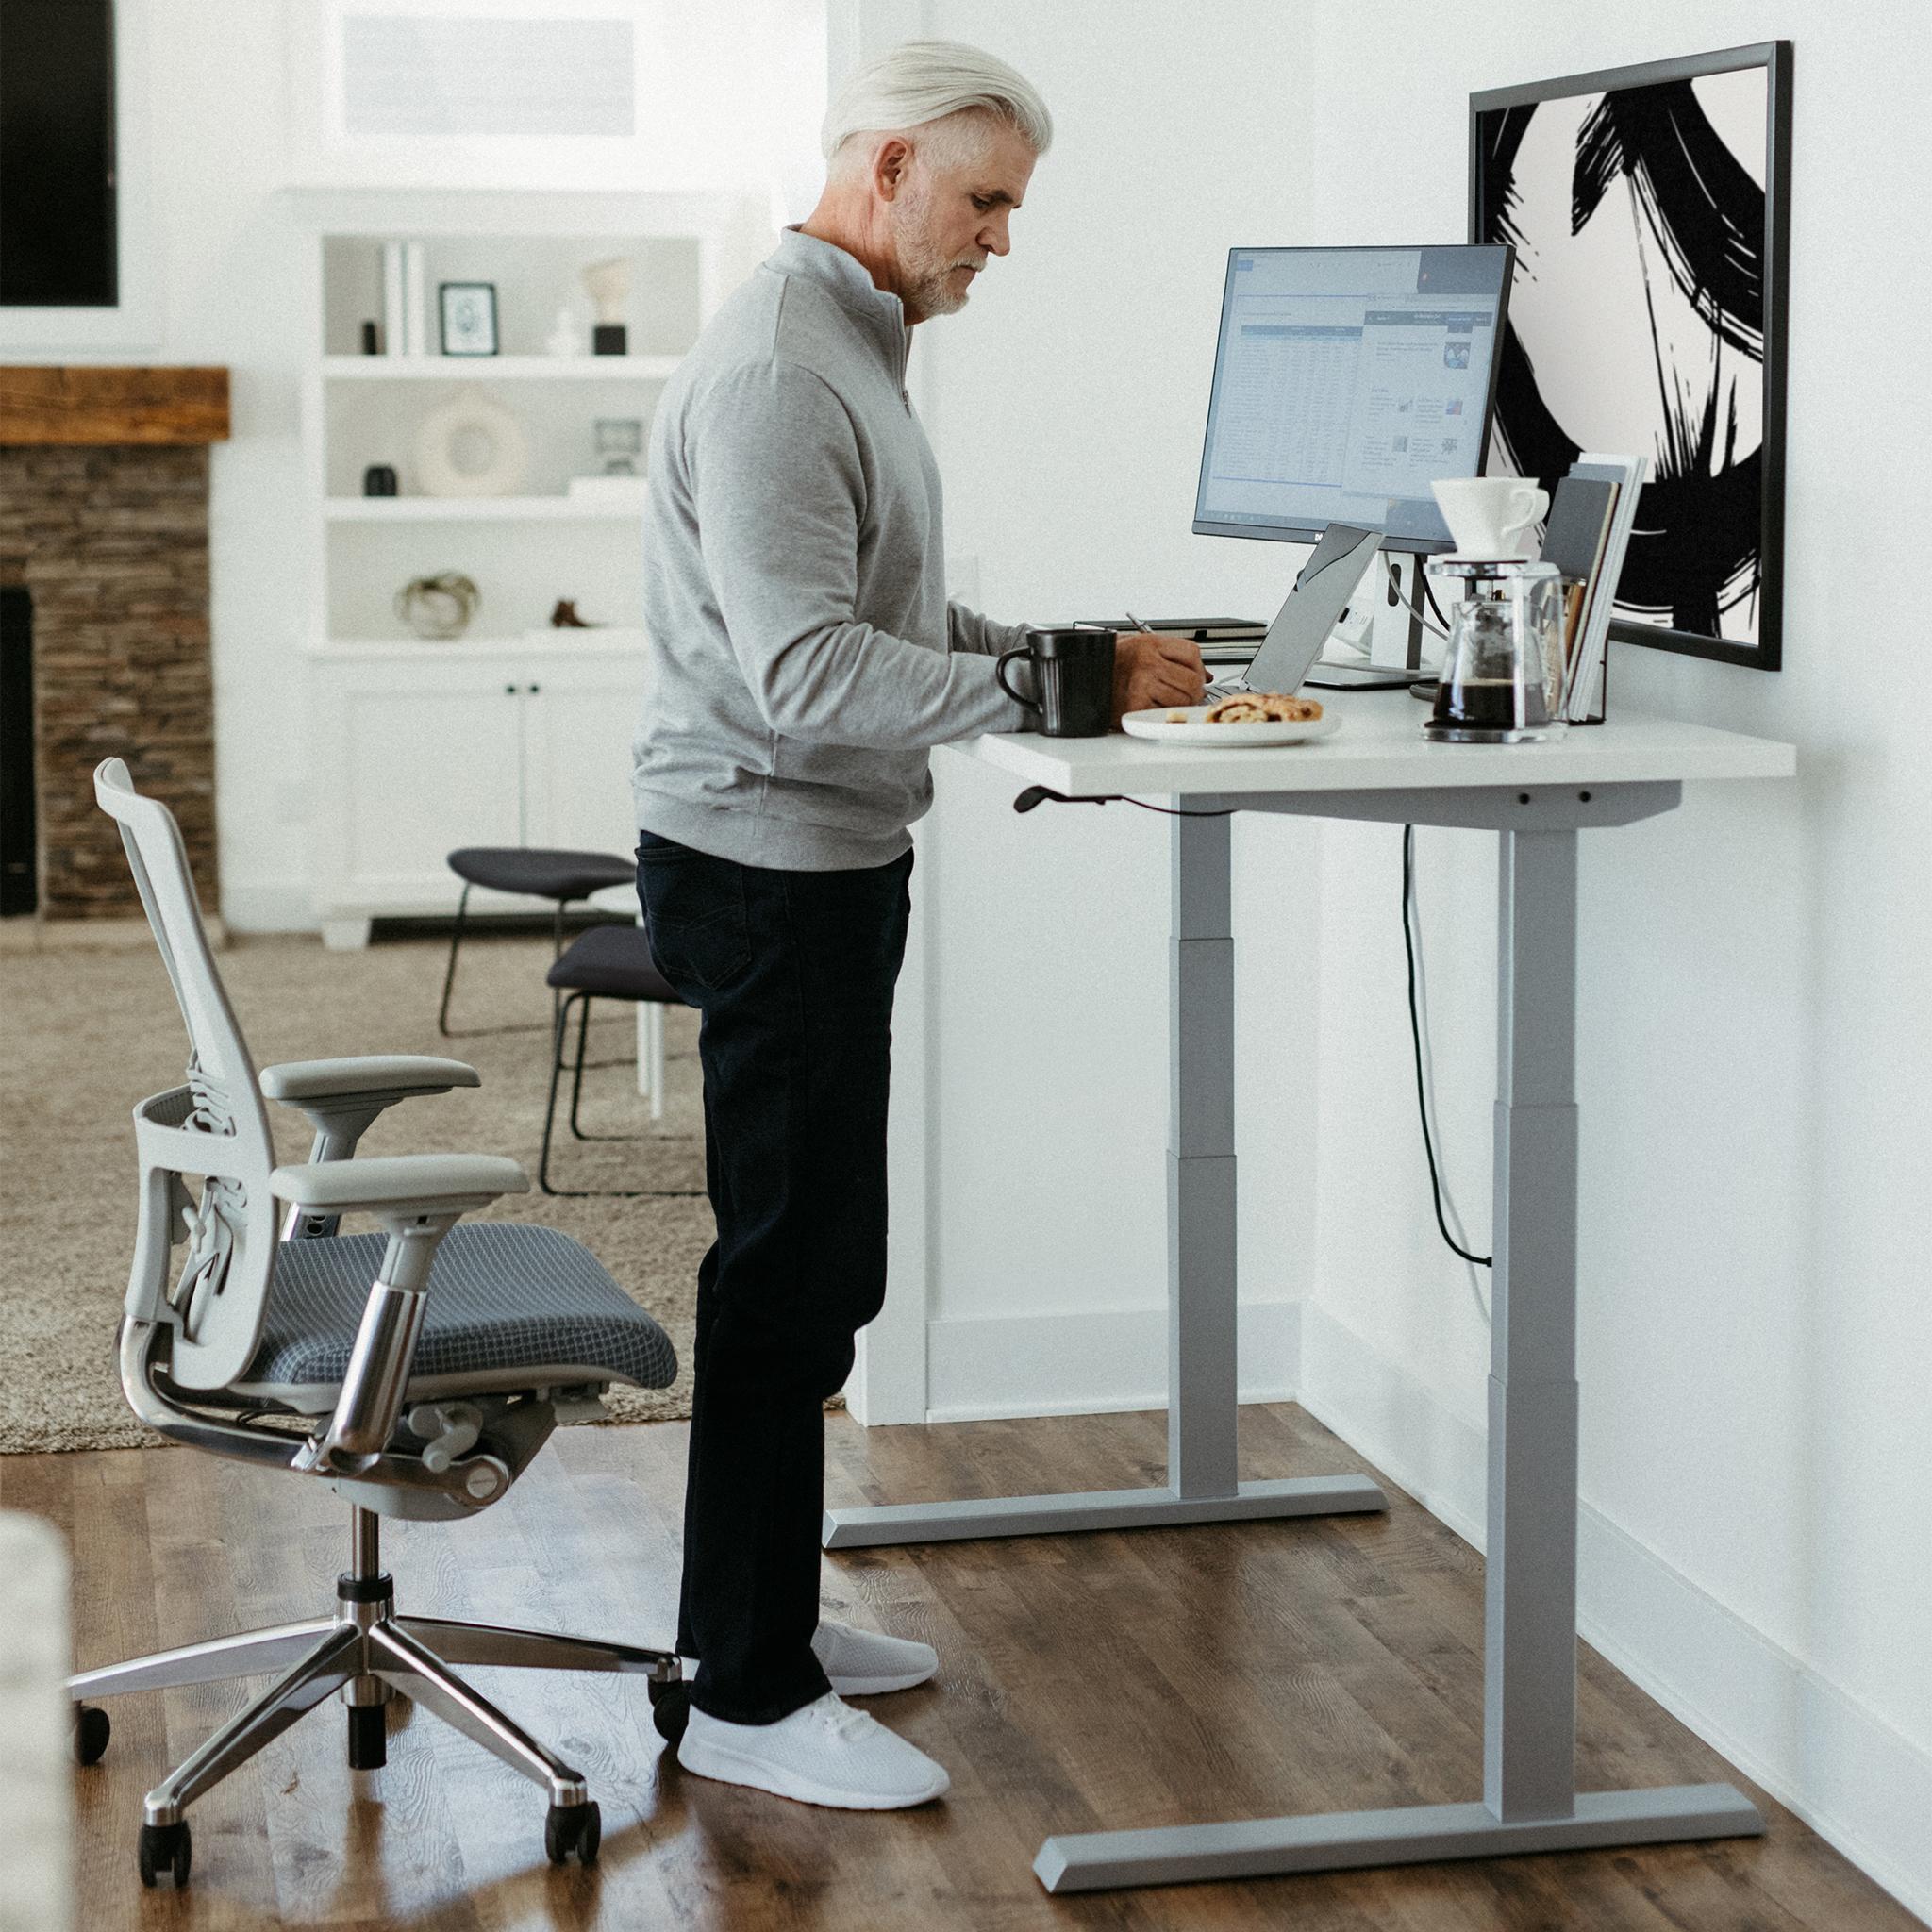 Upside Sit-to-Stand Desk, Extended Range